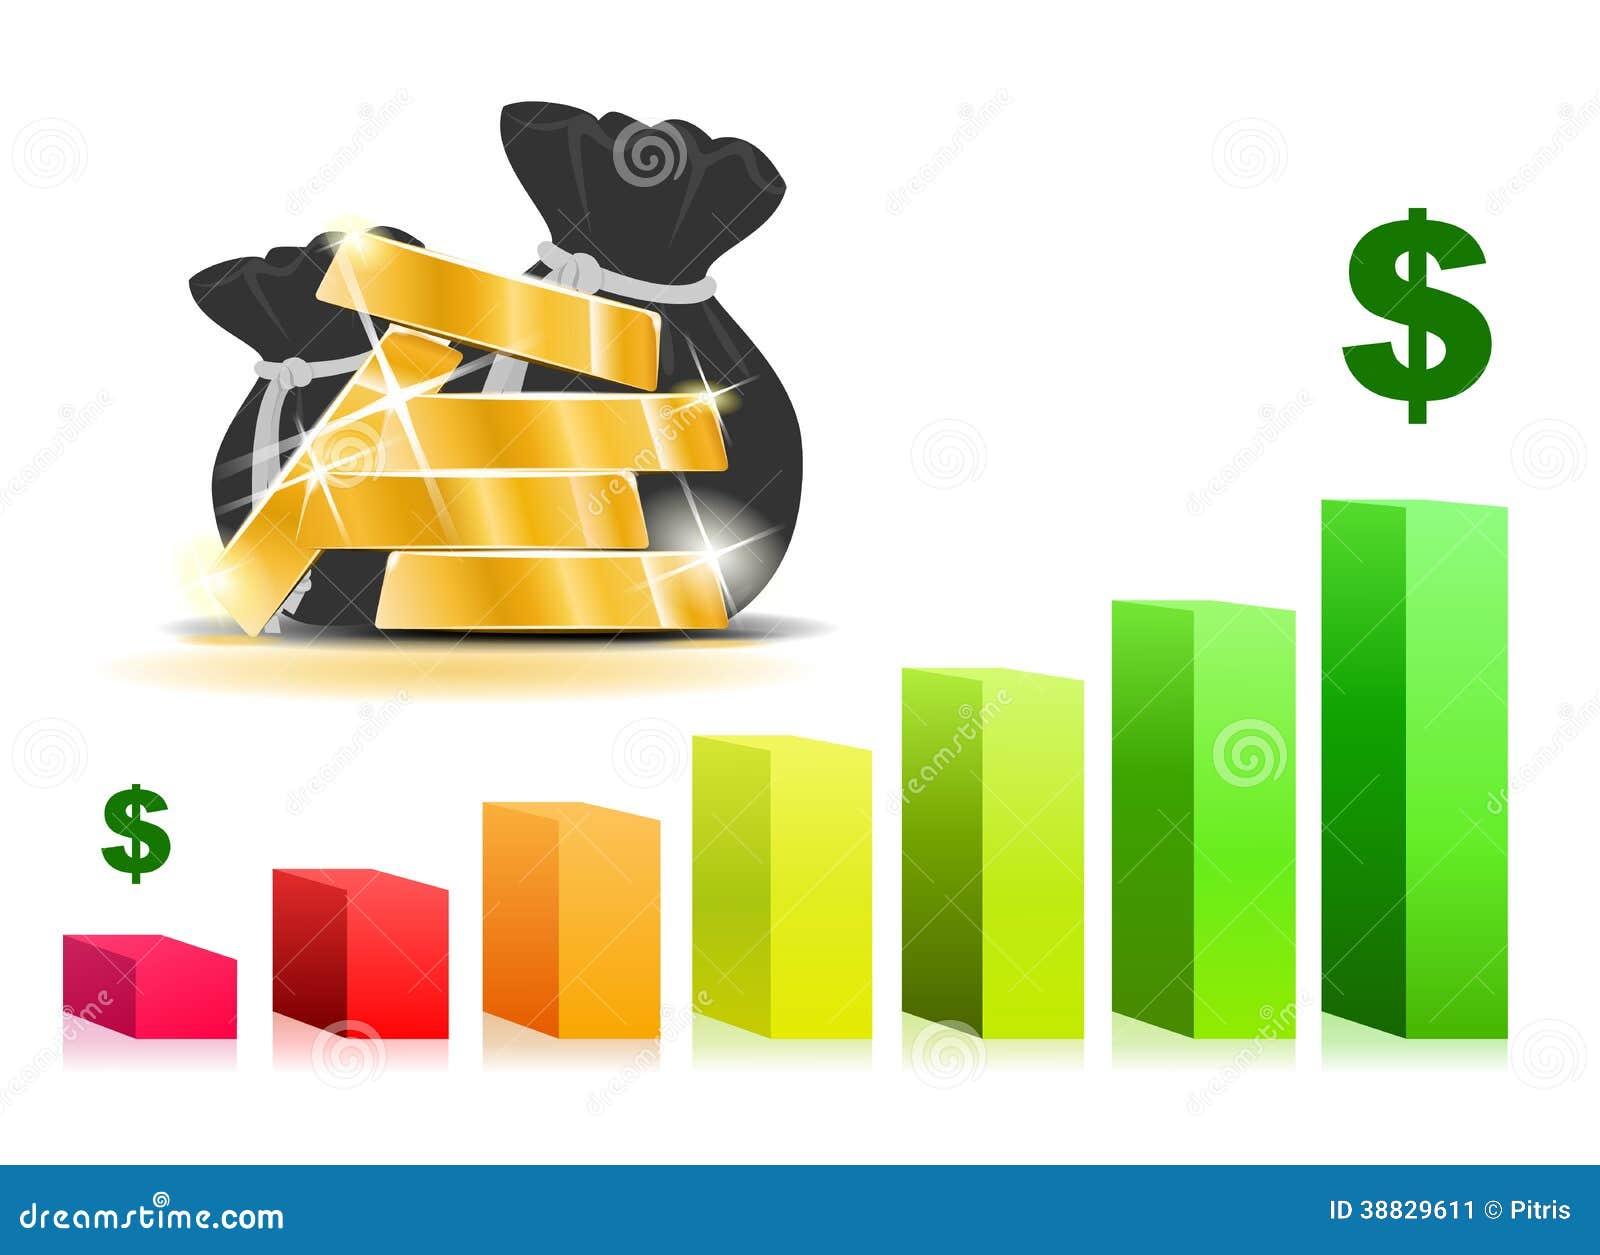 gold bars from bar graph stock vector. illustration of deposit